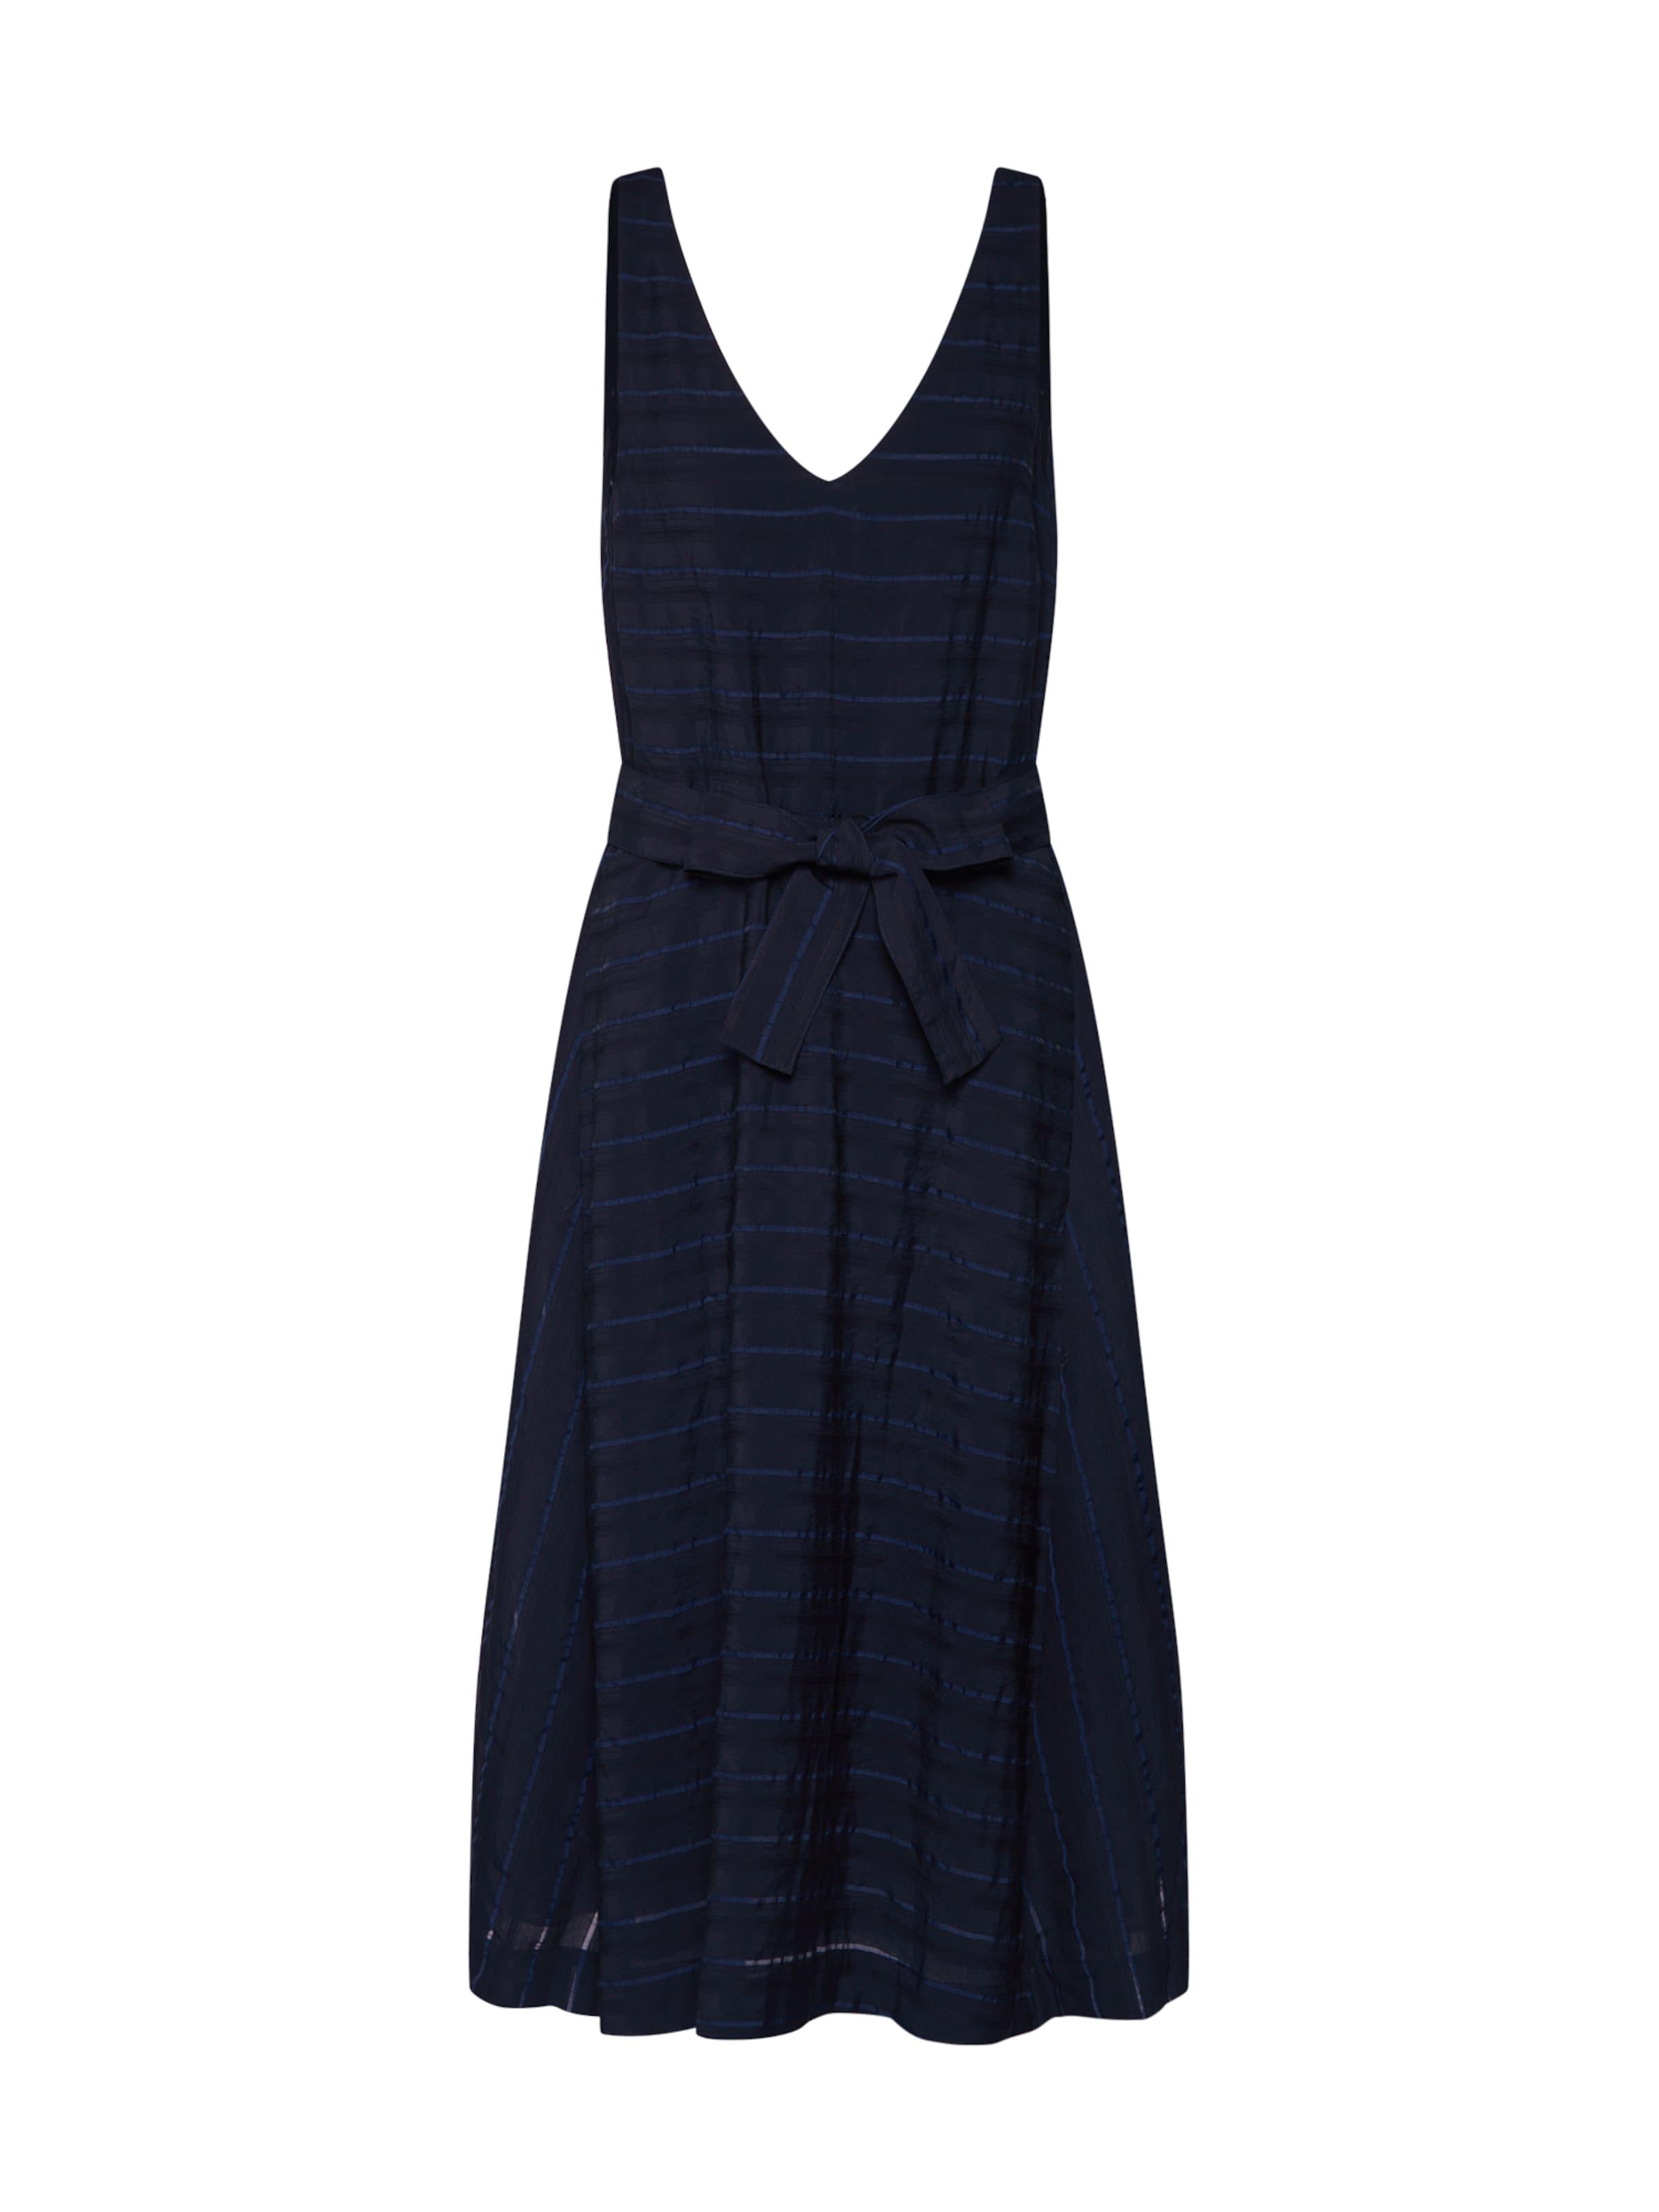 In Samsoeamp; Nachtblau Samsoeamp; In Samsoeamp; Kleid Kleid 'mati' Nachtblau 'mati' Kleid 0n8wkPO